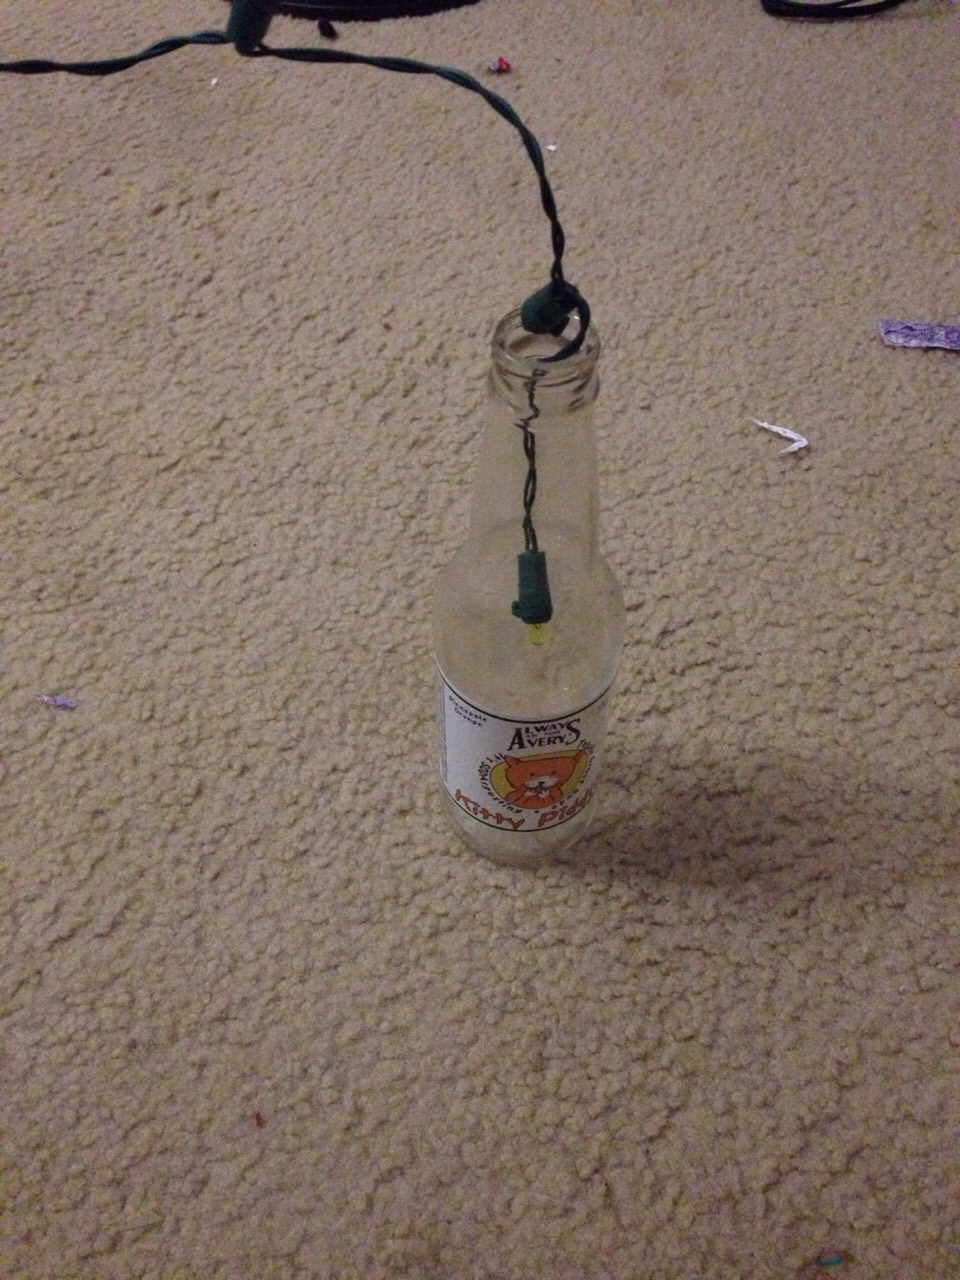 Slide the lights into the bottle, Aaaaand.......